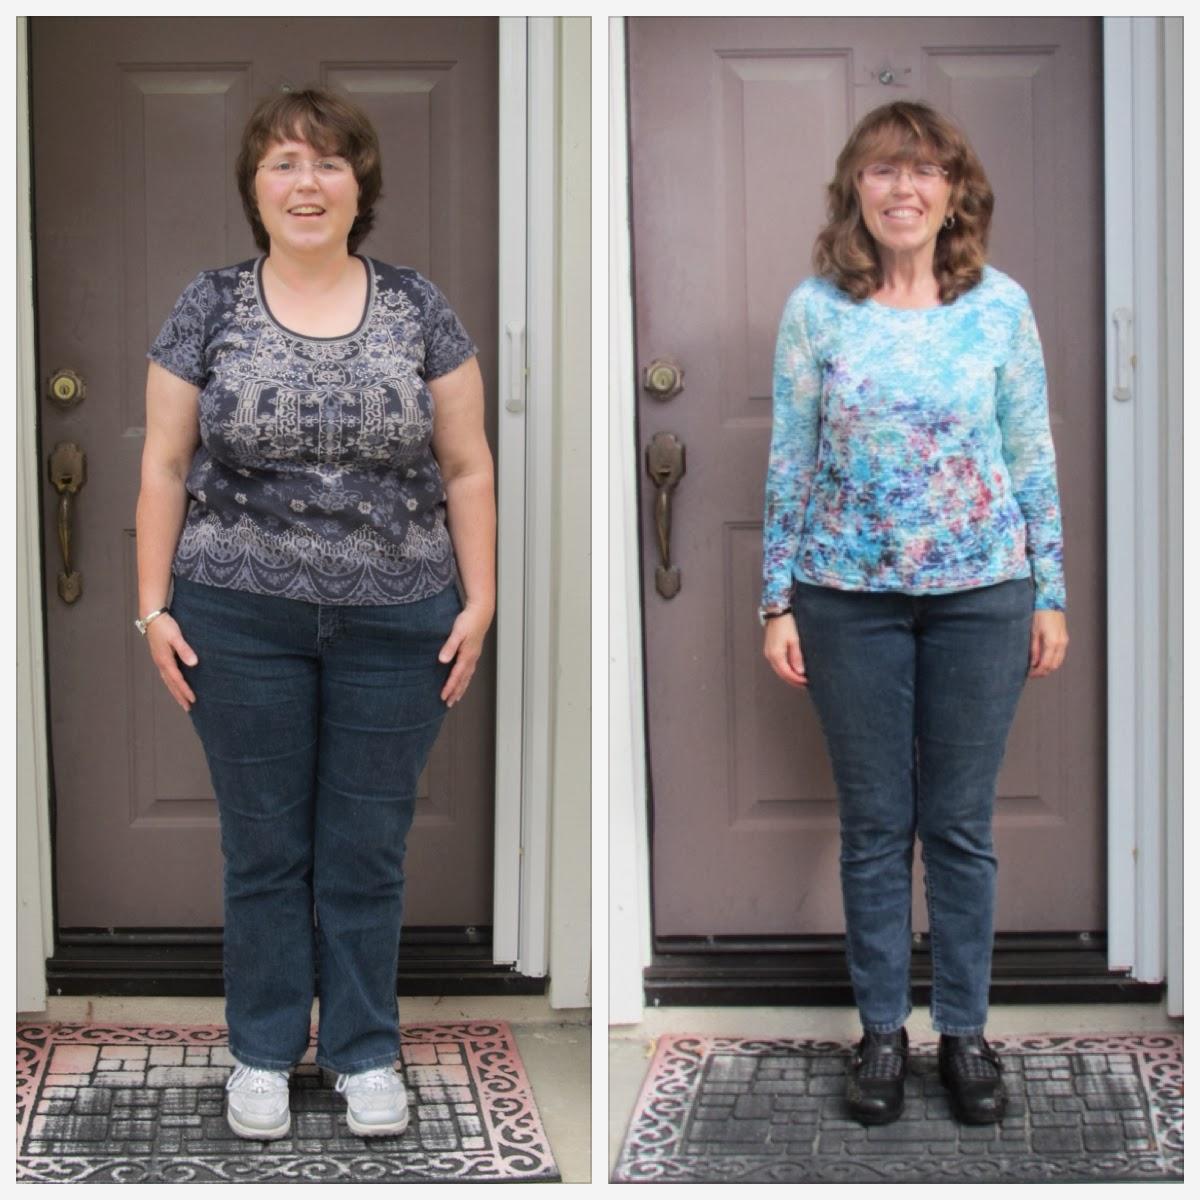 Optimal 365 weight loss not